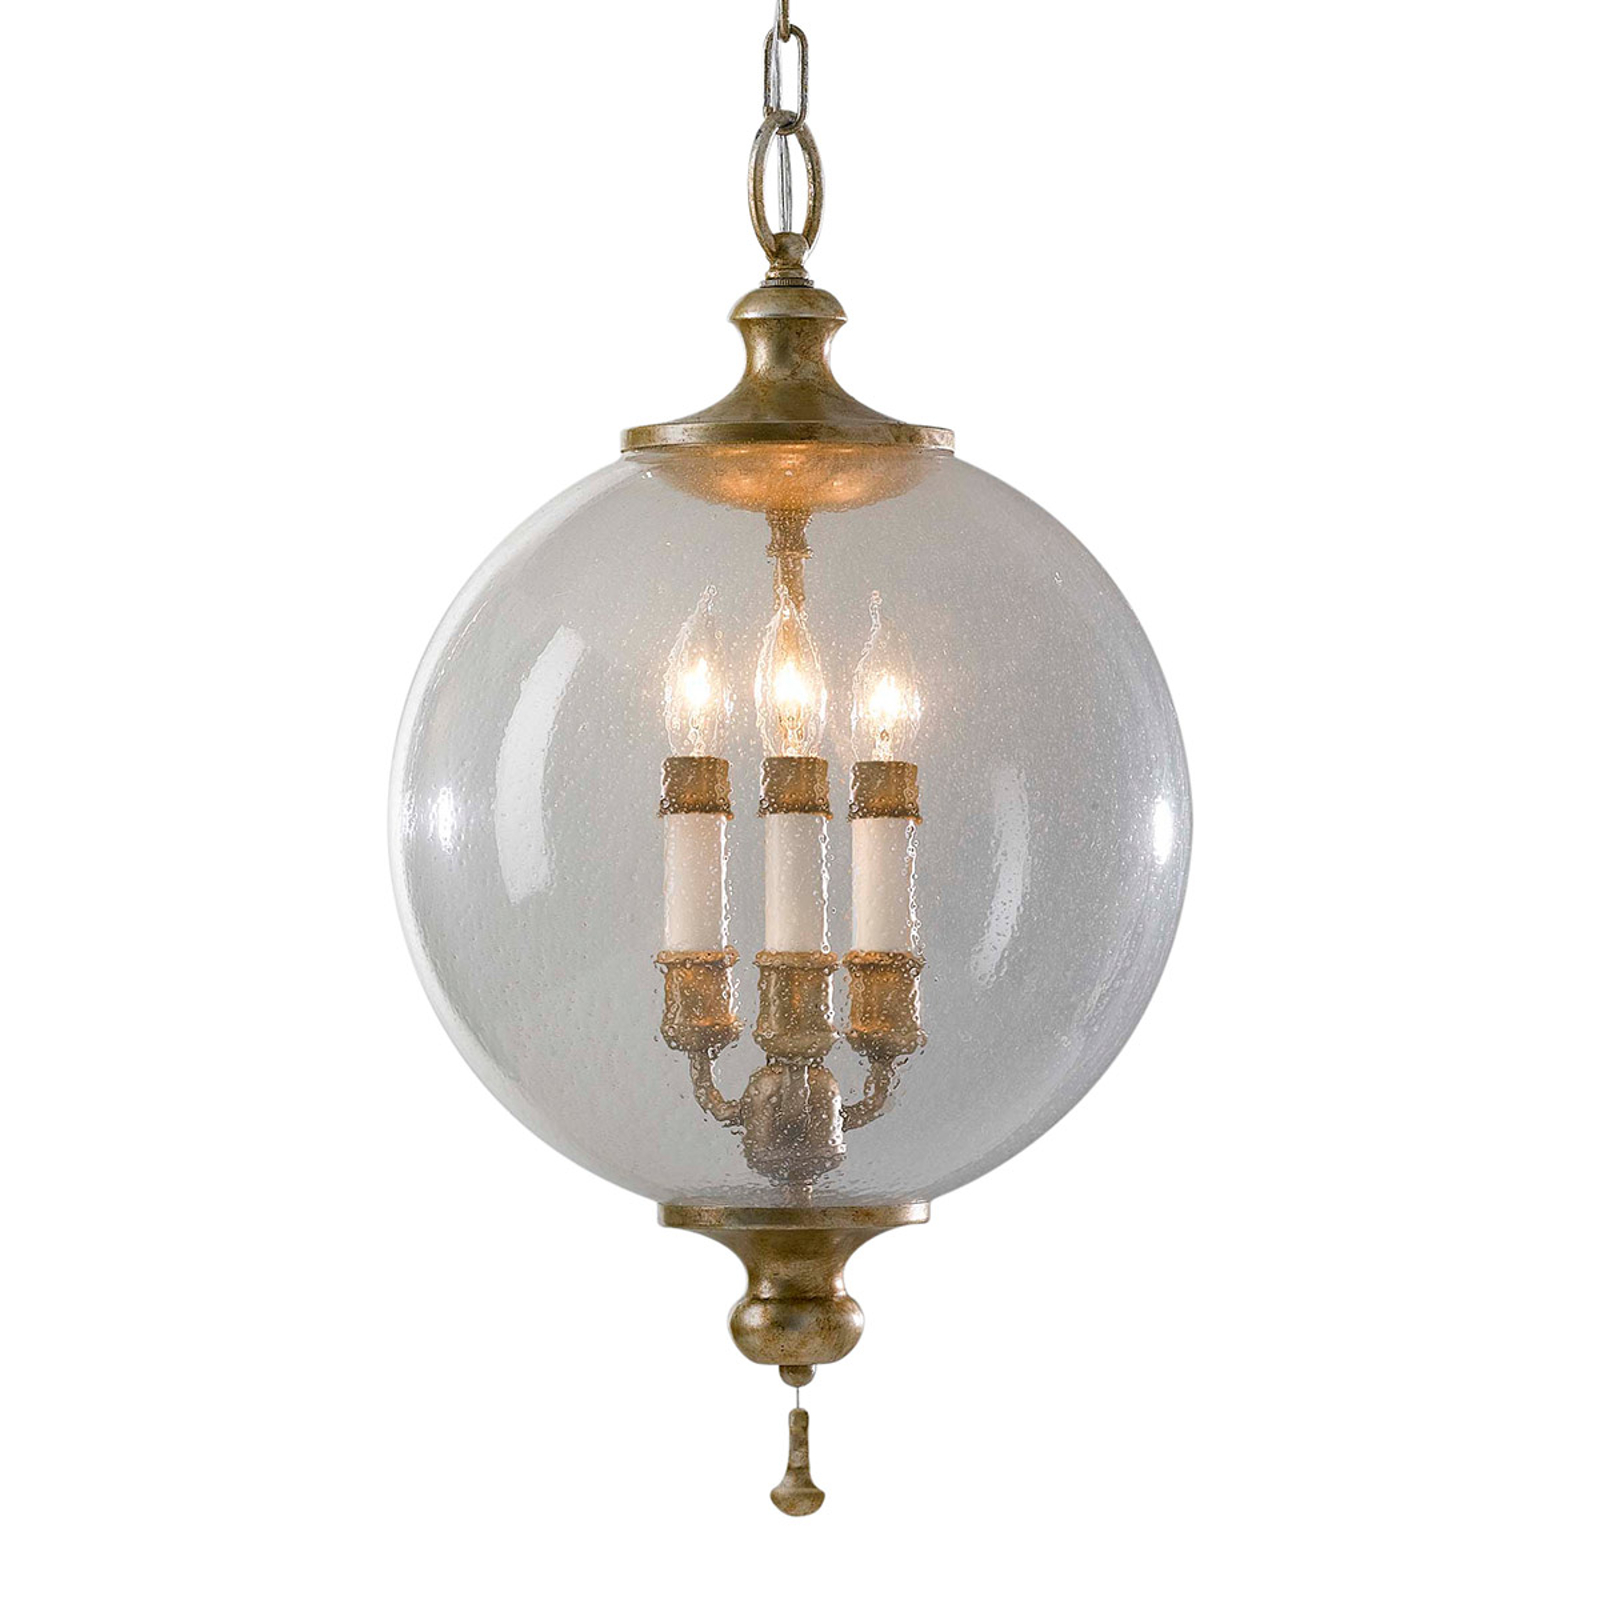 Argento Hanging Light Elegant_3048240_1